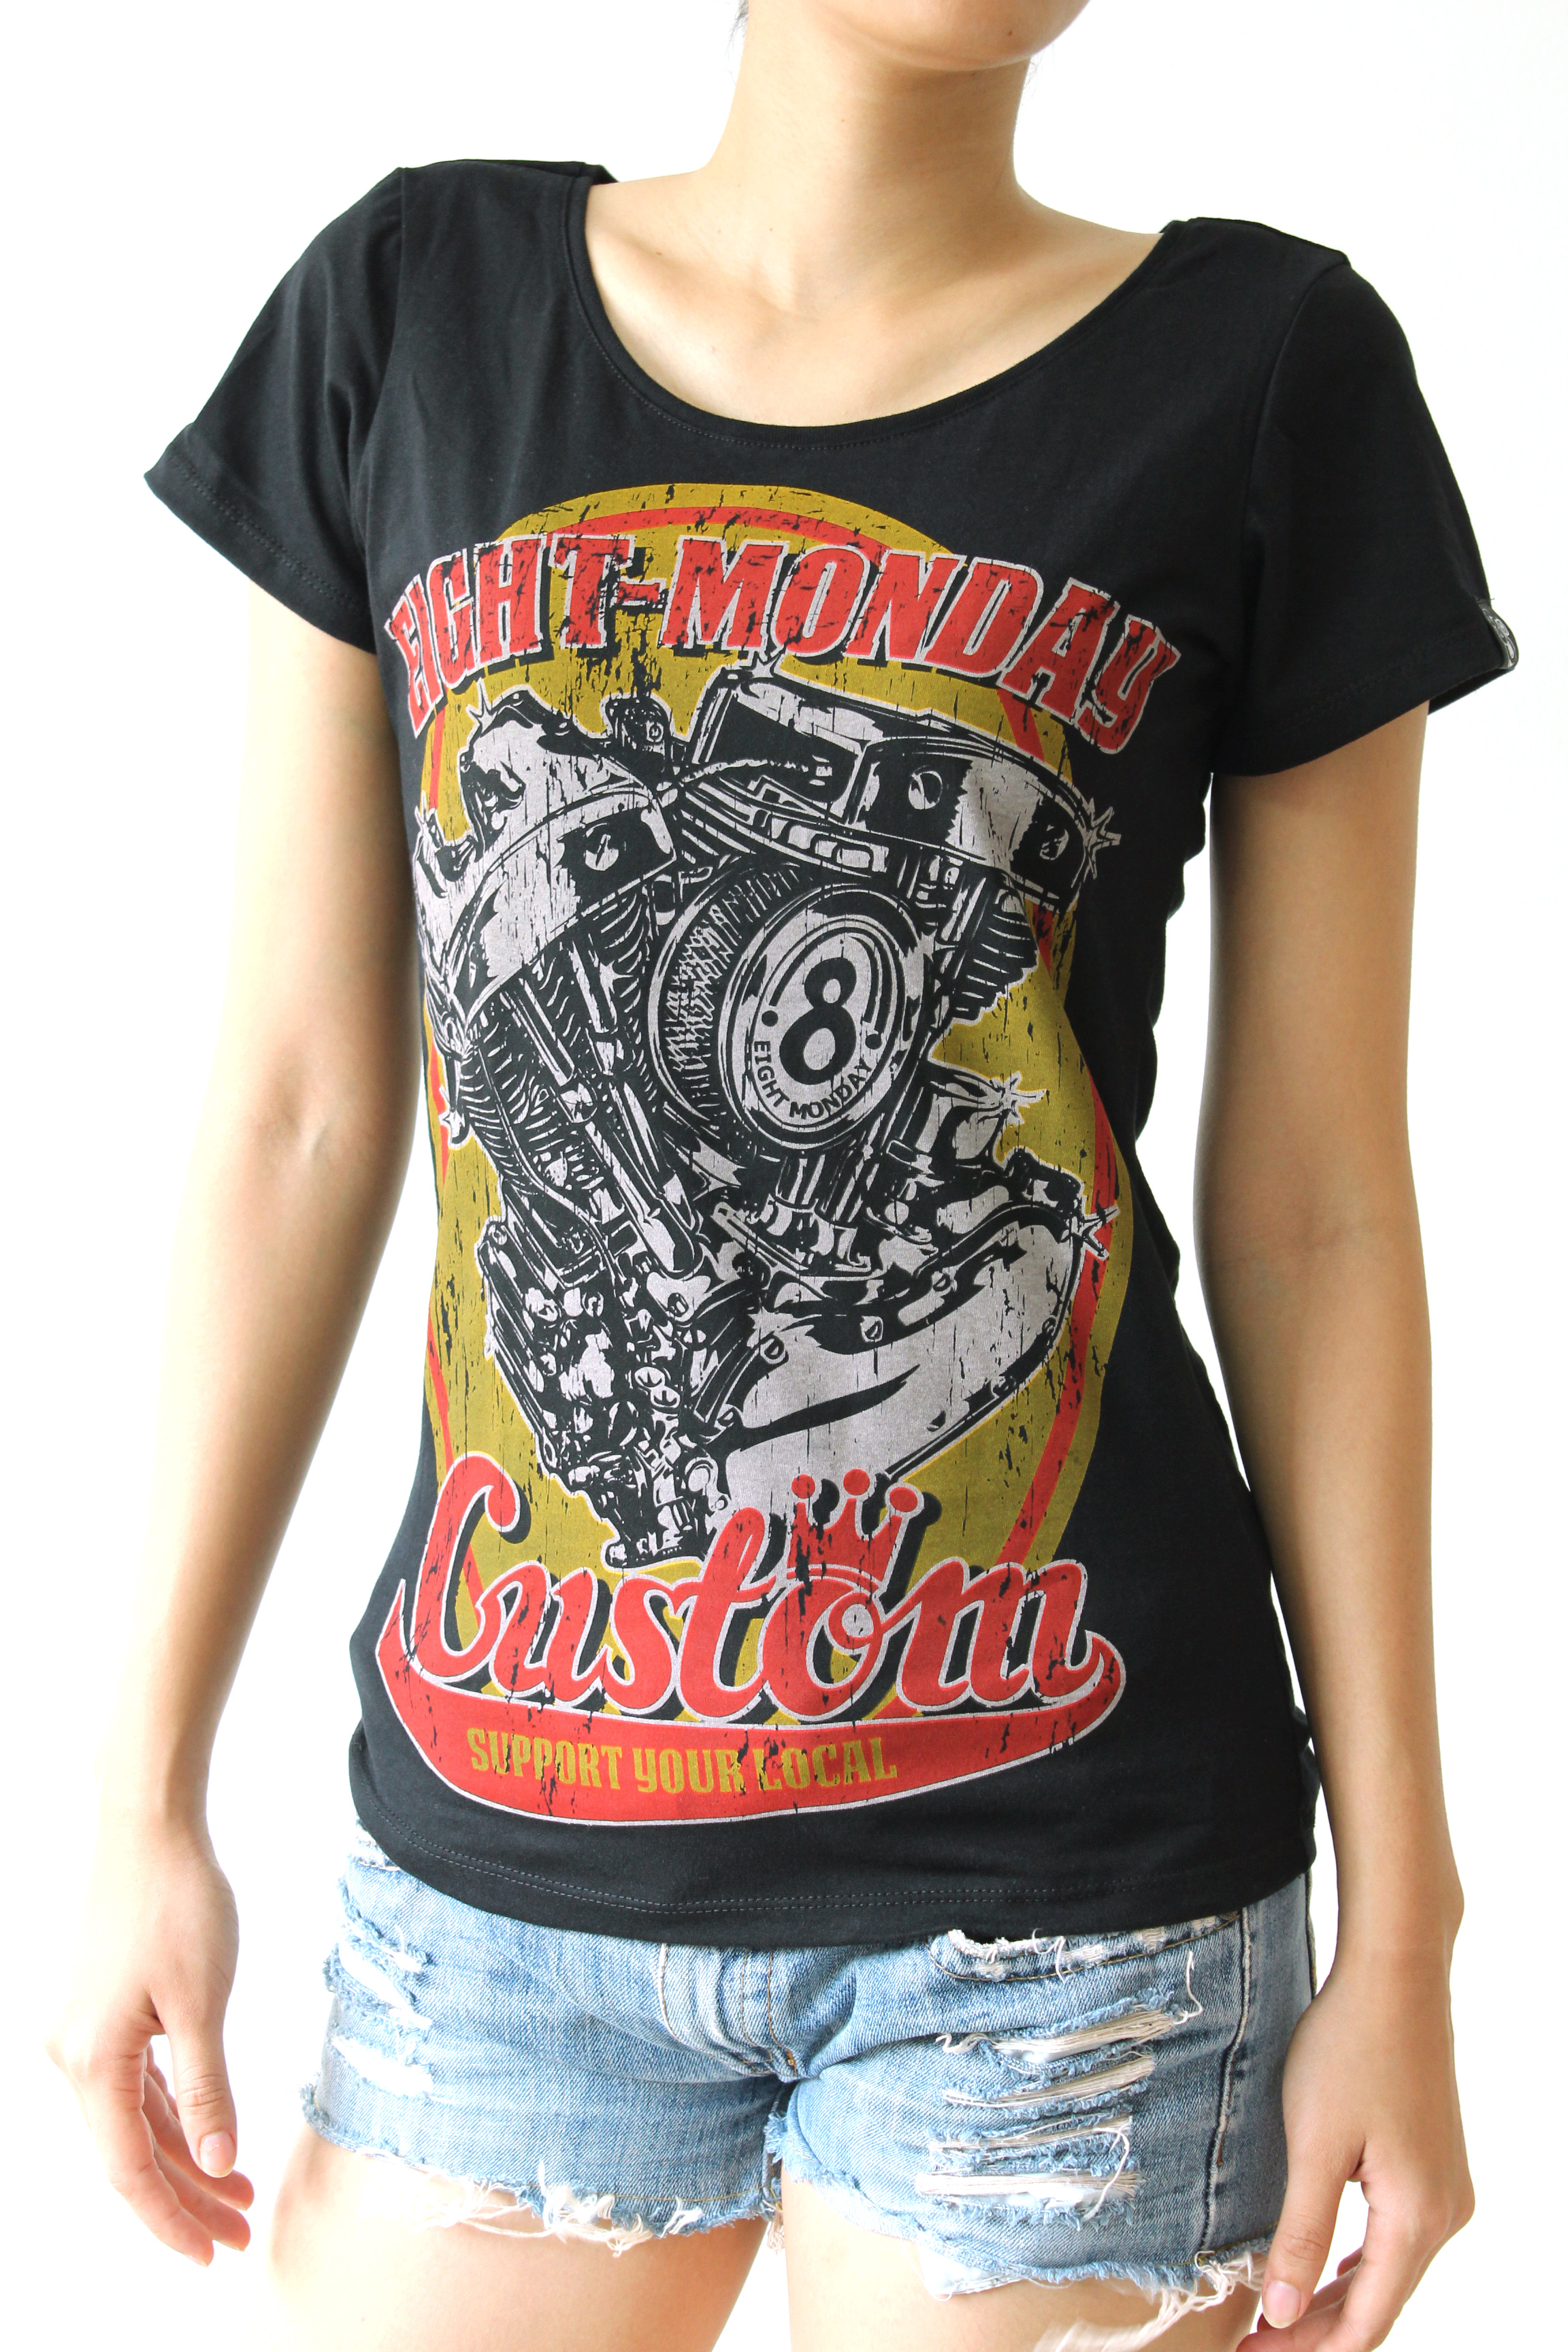 eight_monday_rockabilly_vintage_eagle_west_coast_chopper_harley_motorcycle_t_shirts_3.jpg